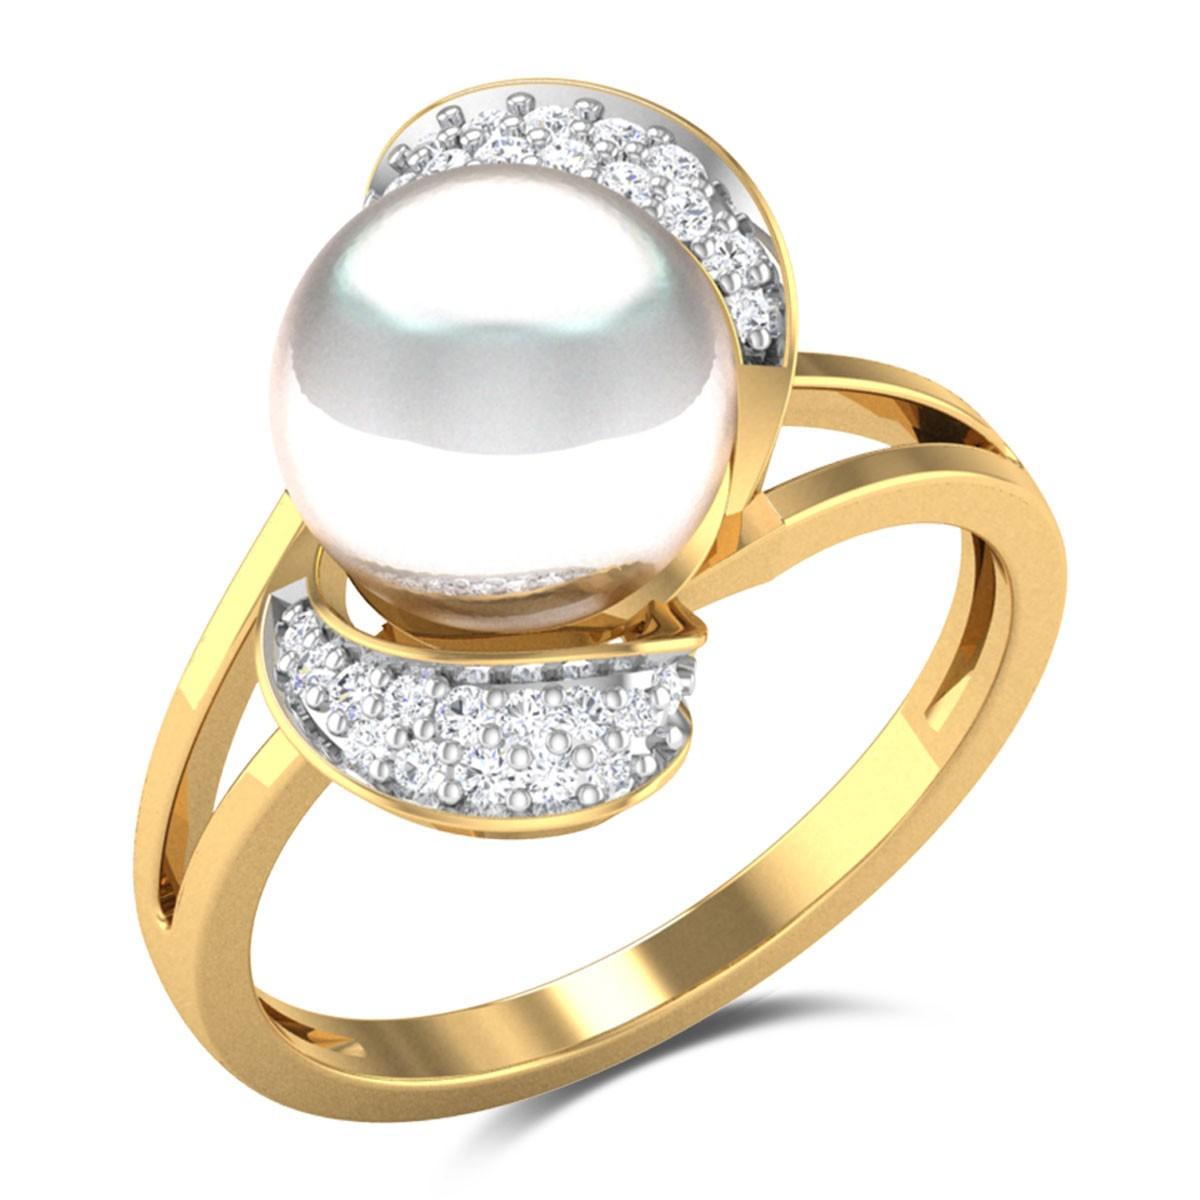 Aanya Pearl Blossom Ring